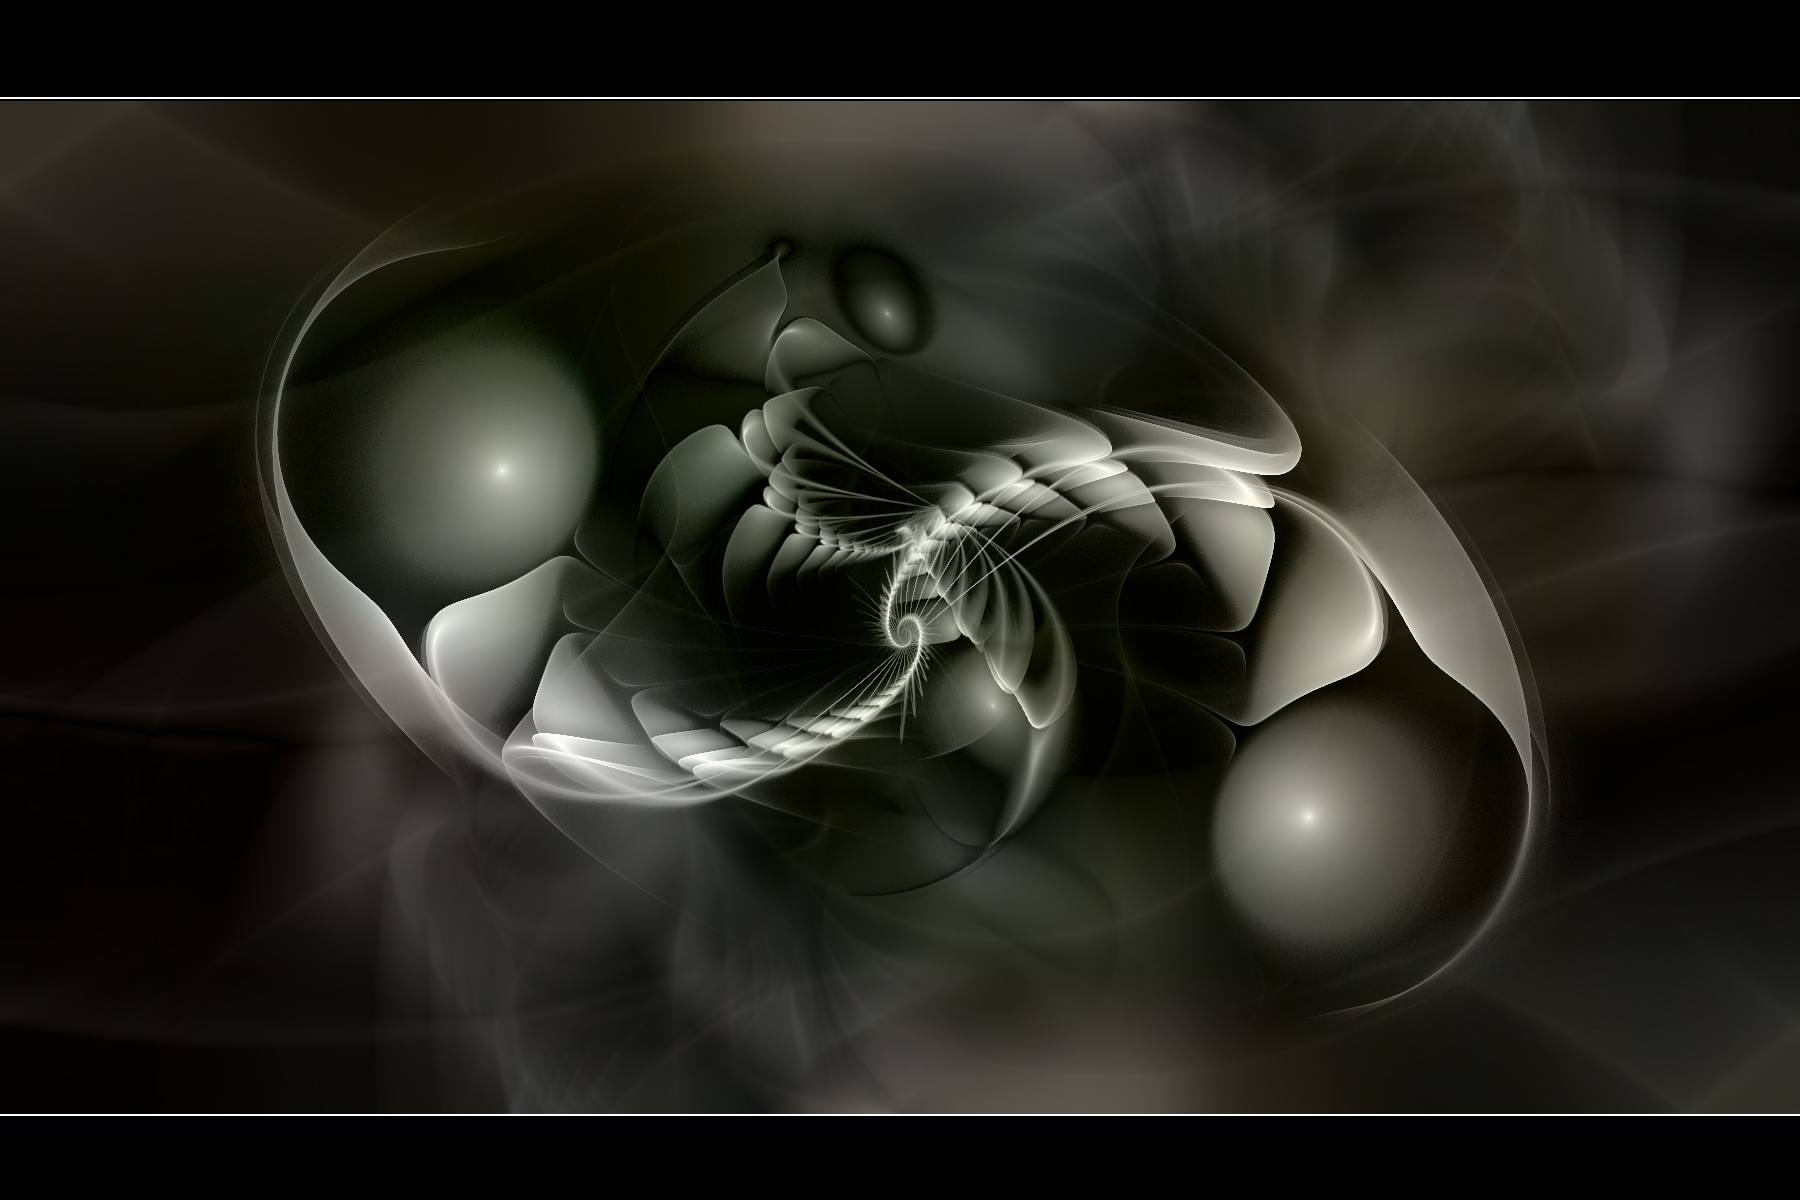 Akima mystic by viperv6